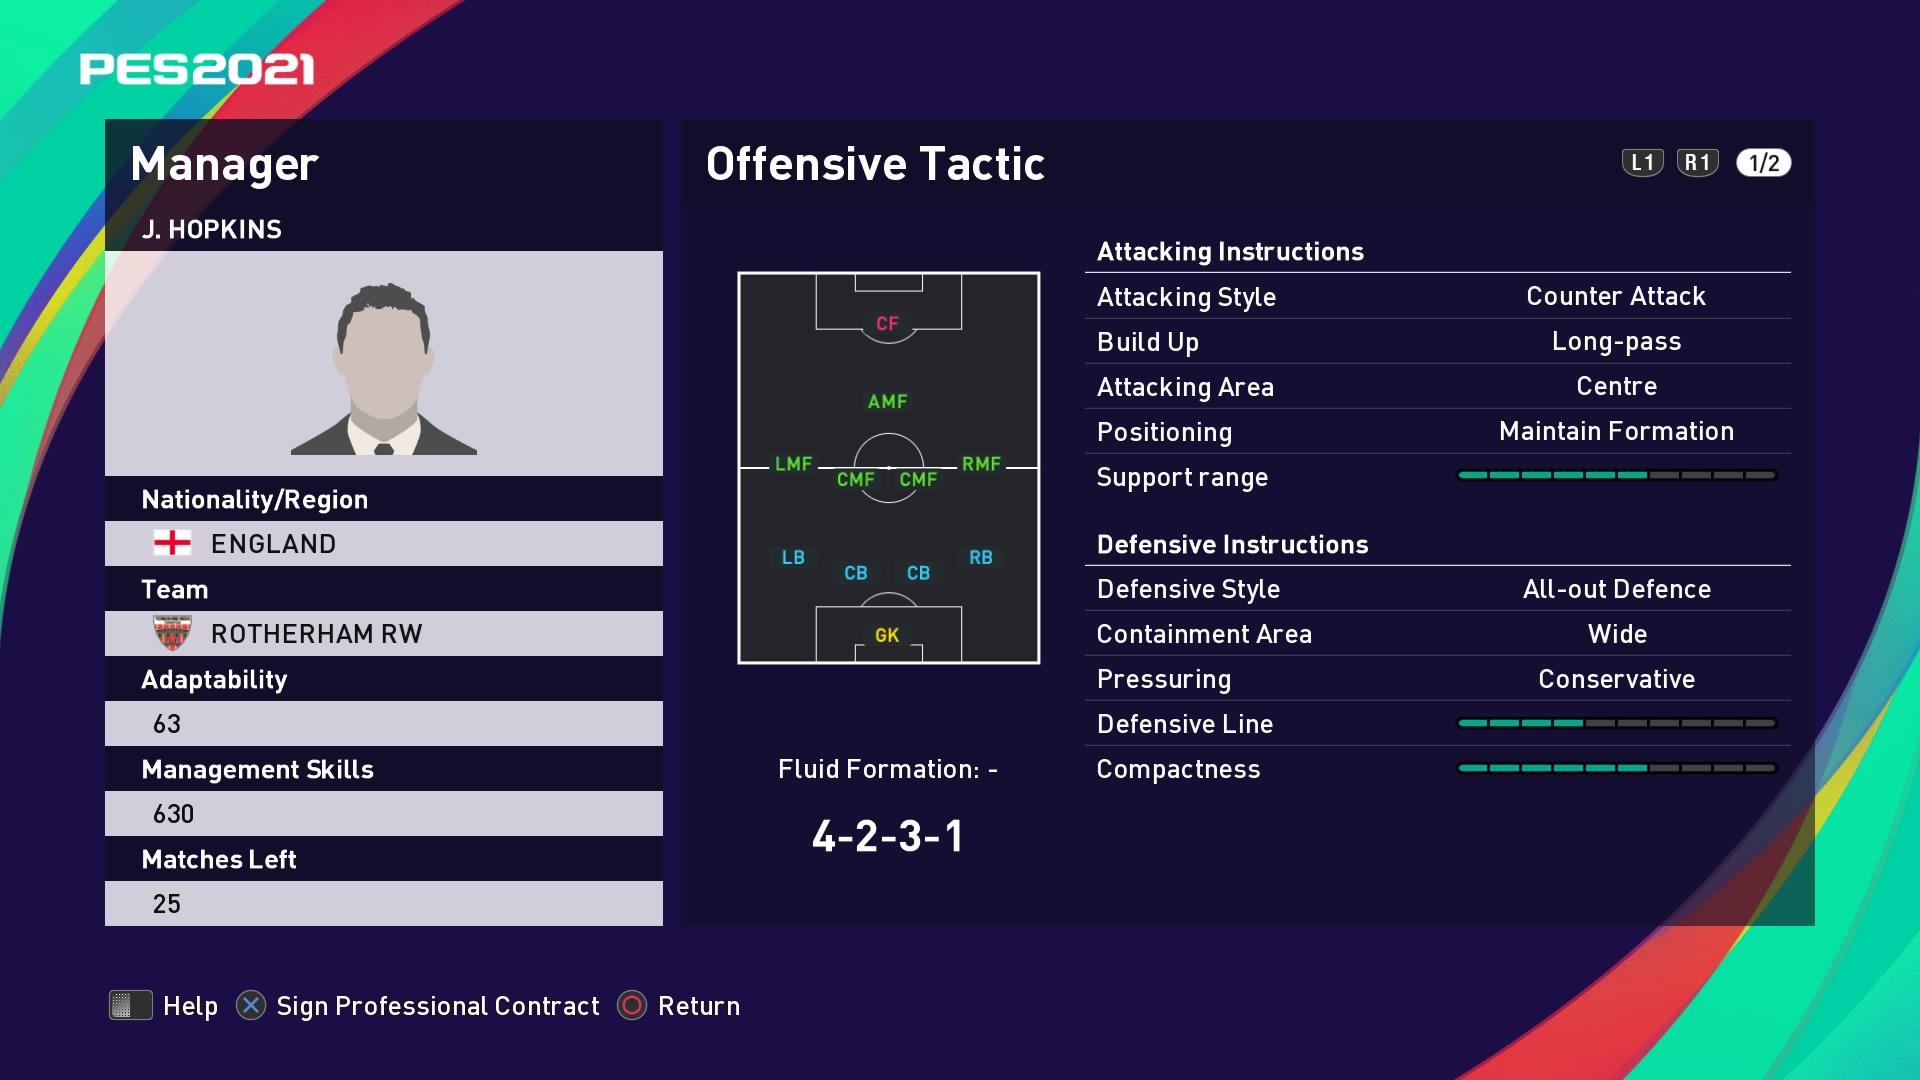 J. Hopkins (Paul Warne) Offensive Tactic in PES 2021 myClub